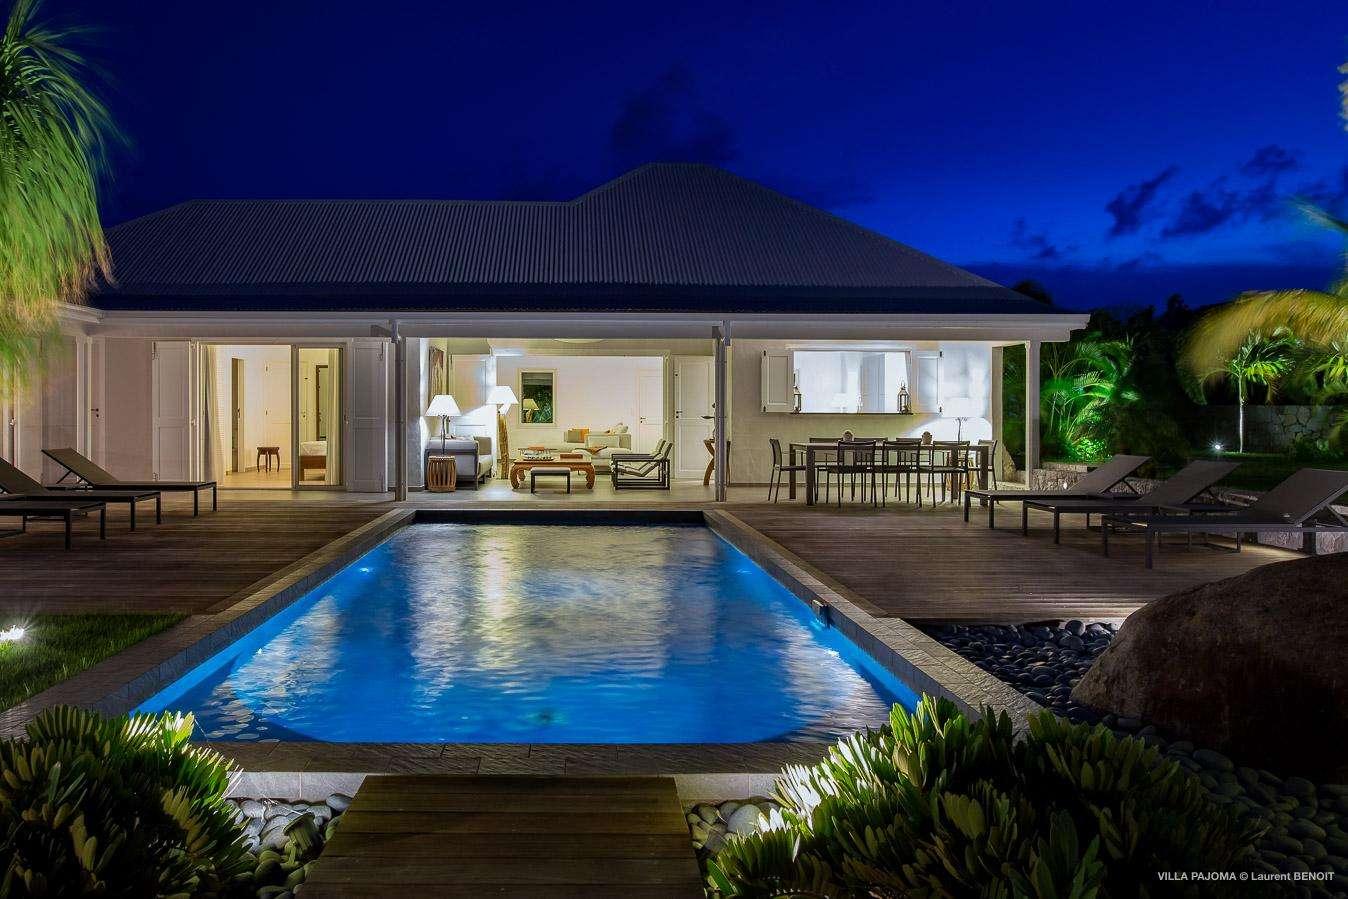 Luxury villa rentals caribbean - St barthelemy - Lurin - No location 4 - Pajoma - Image 1/63